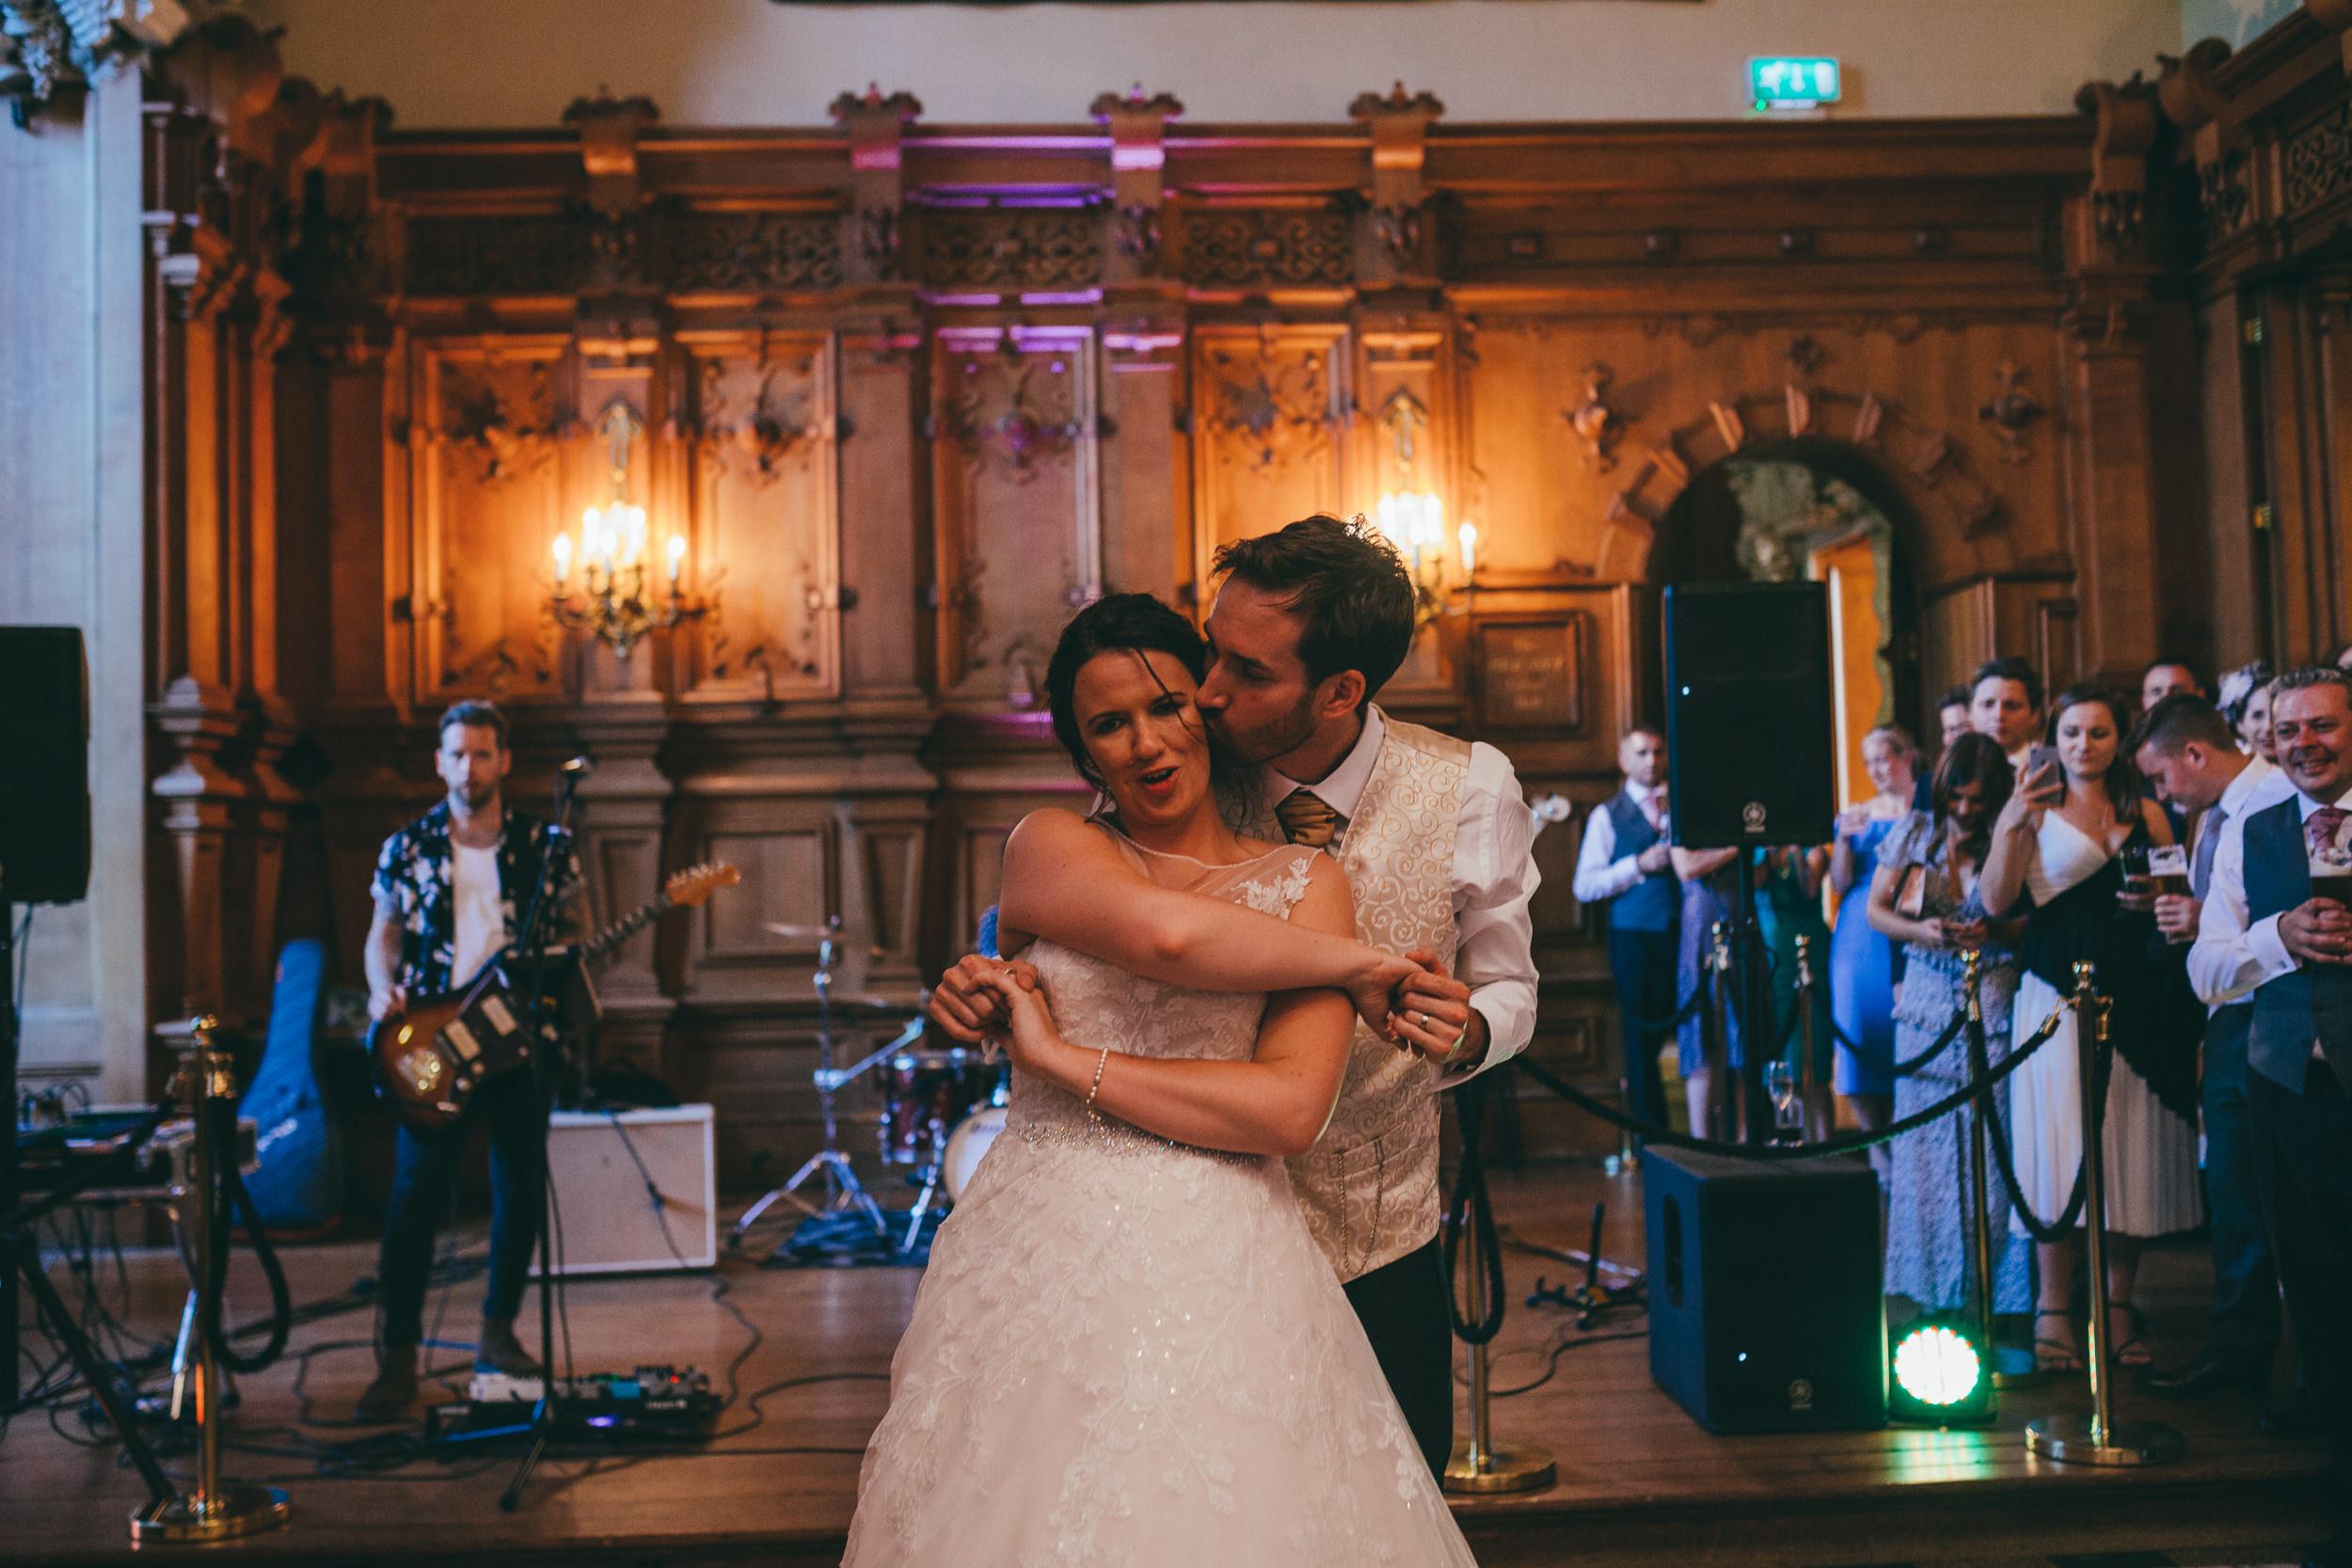 Bride and groom dancing at Harlaxton Manor